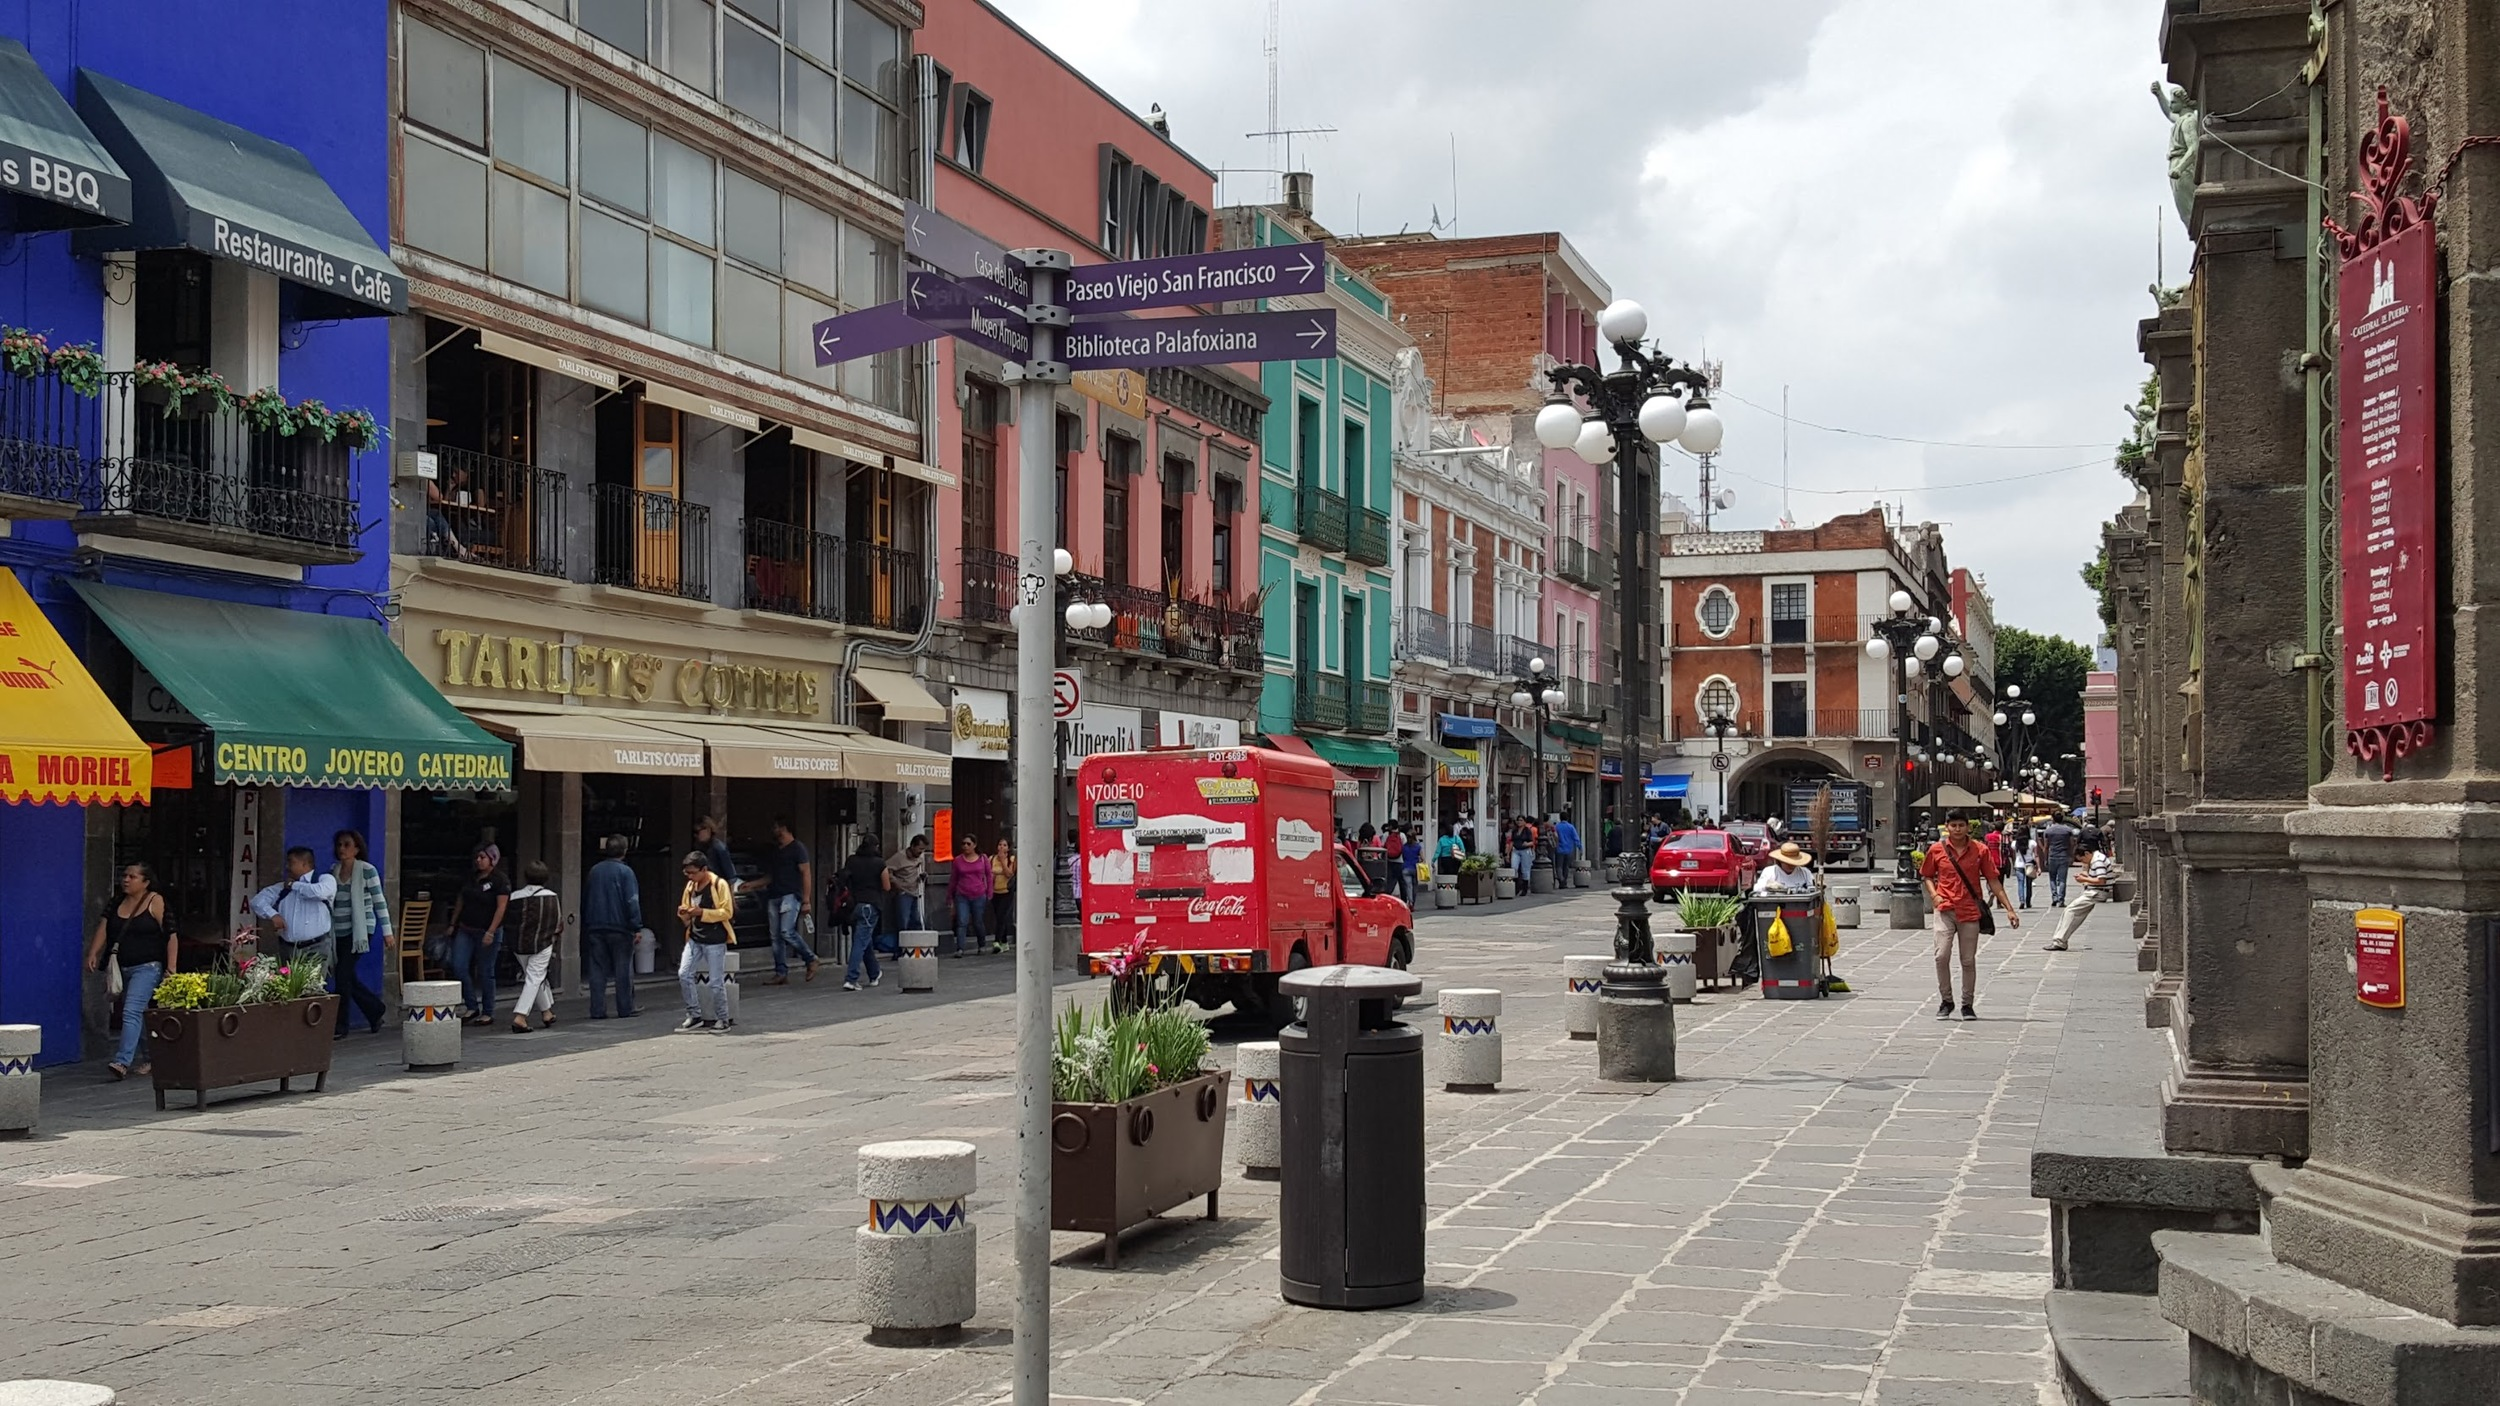 A street in Puebla.